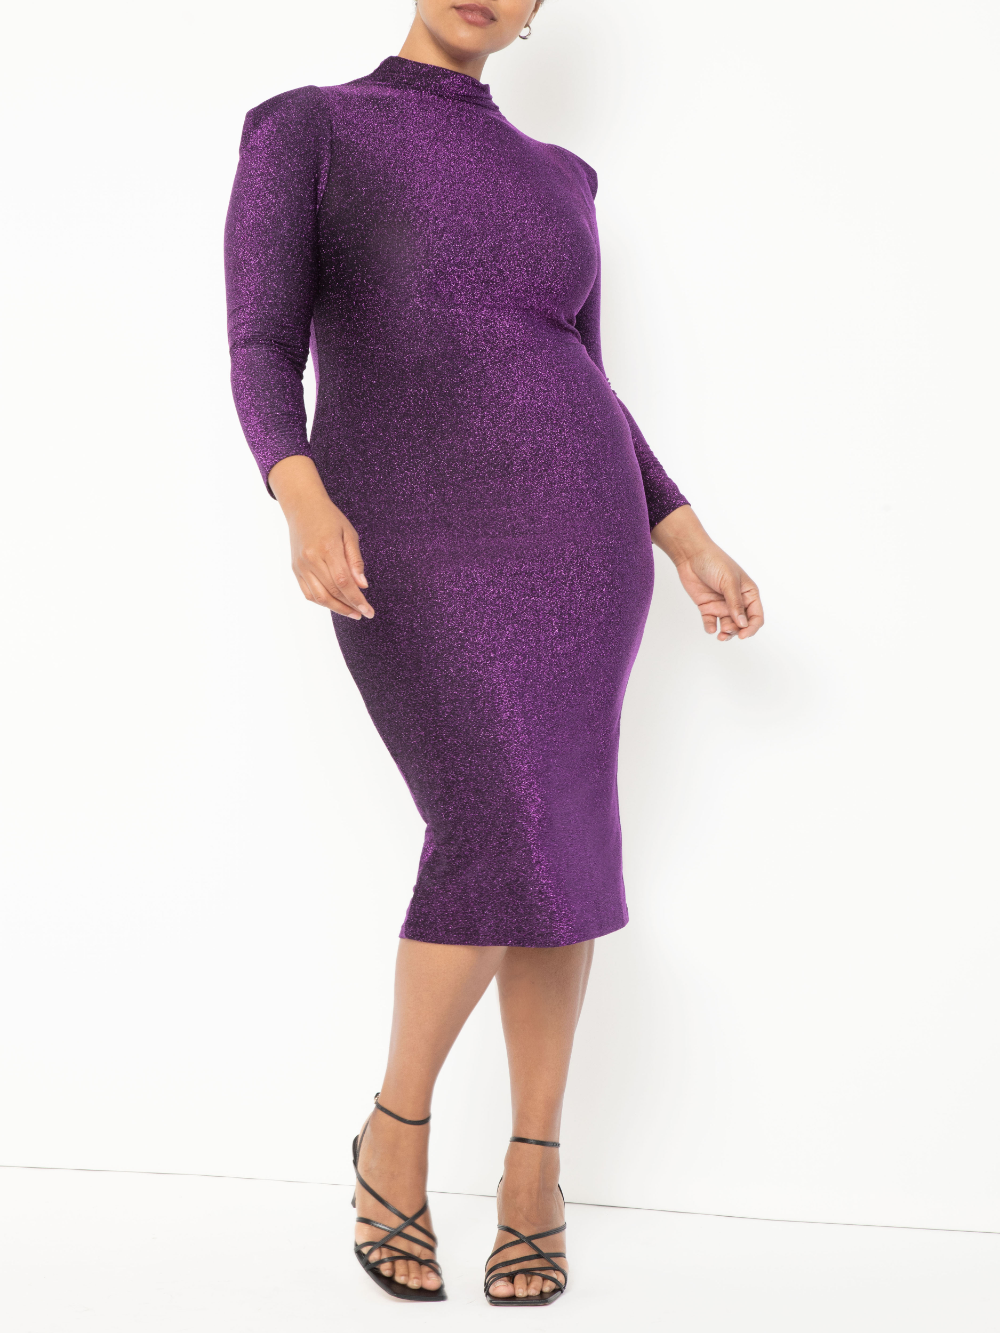 Eloquii Eloquii Women S Plus Size Turtleneck Bodycon Dress Walmart Com Bodycon Dress Dresses Bodycon [ 1333 x 1000 Pixel ]